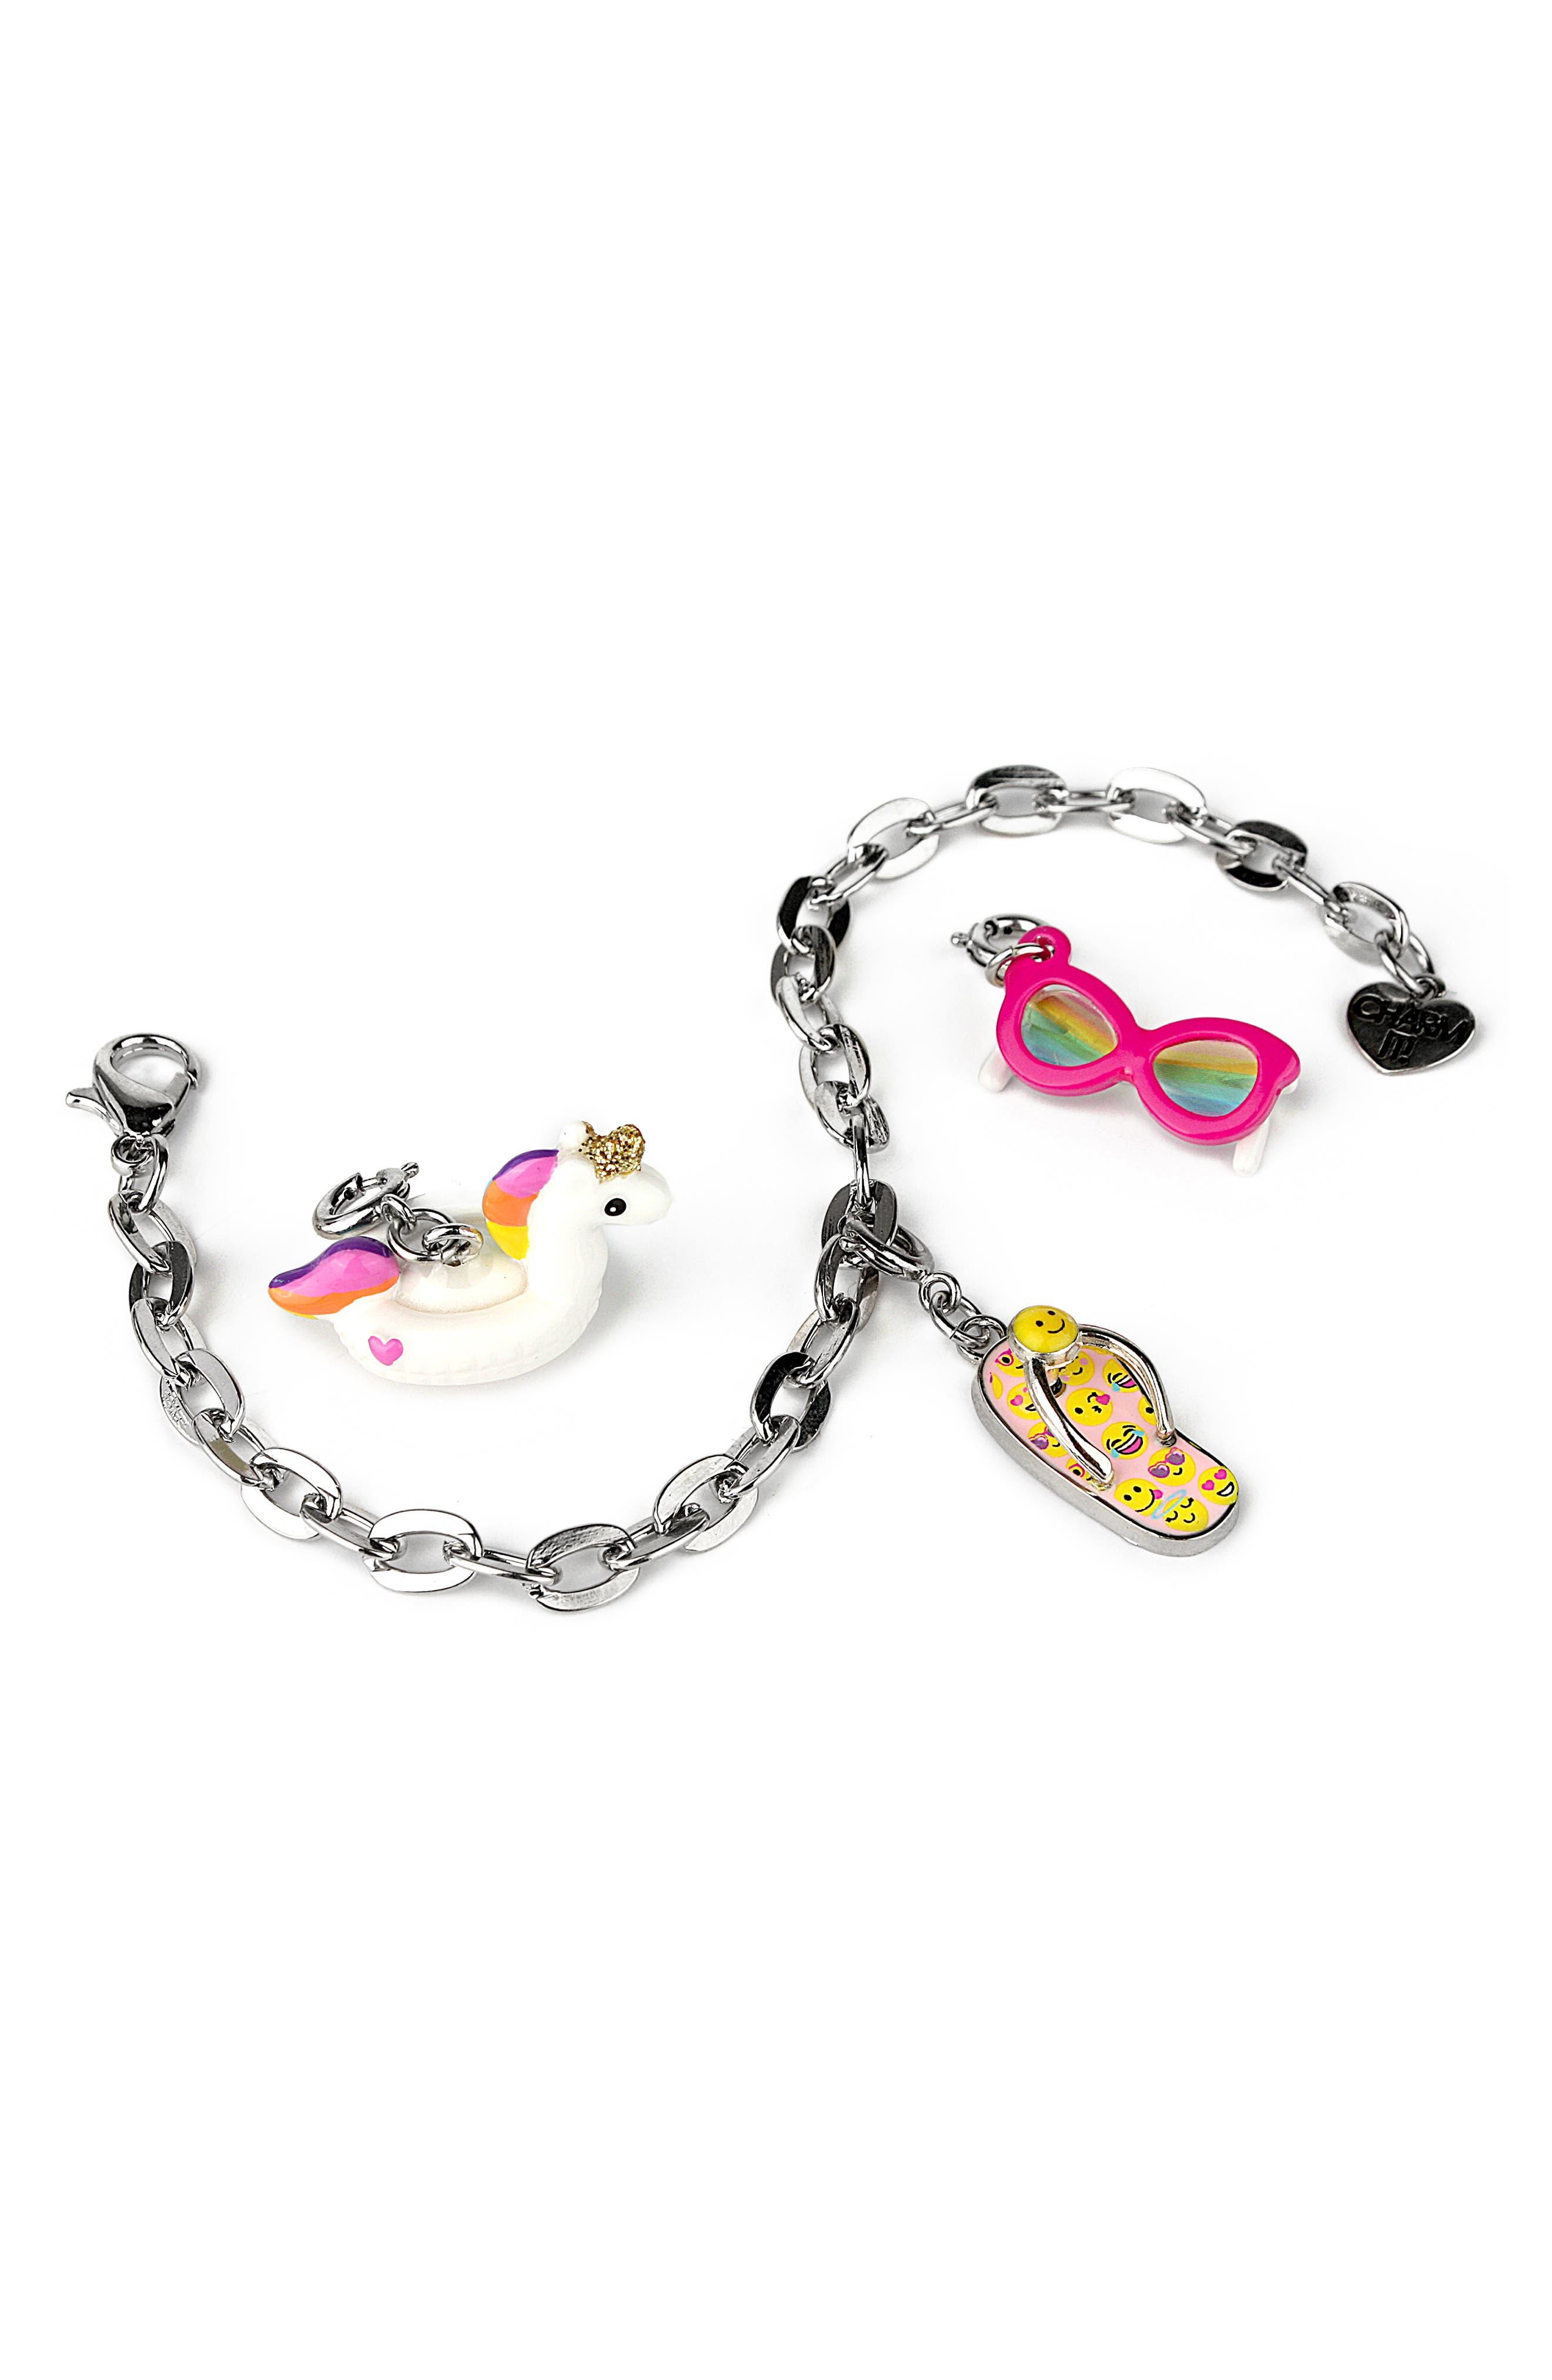 Girls High Intencity Charm It Fun In The Sun Charm Bracelet Gift Set